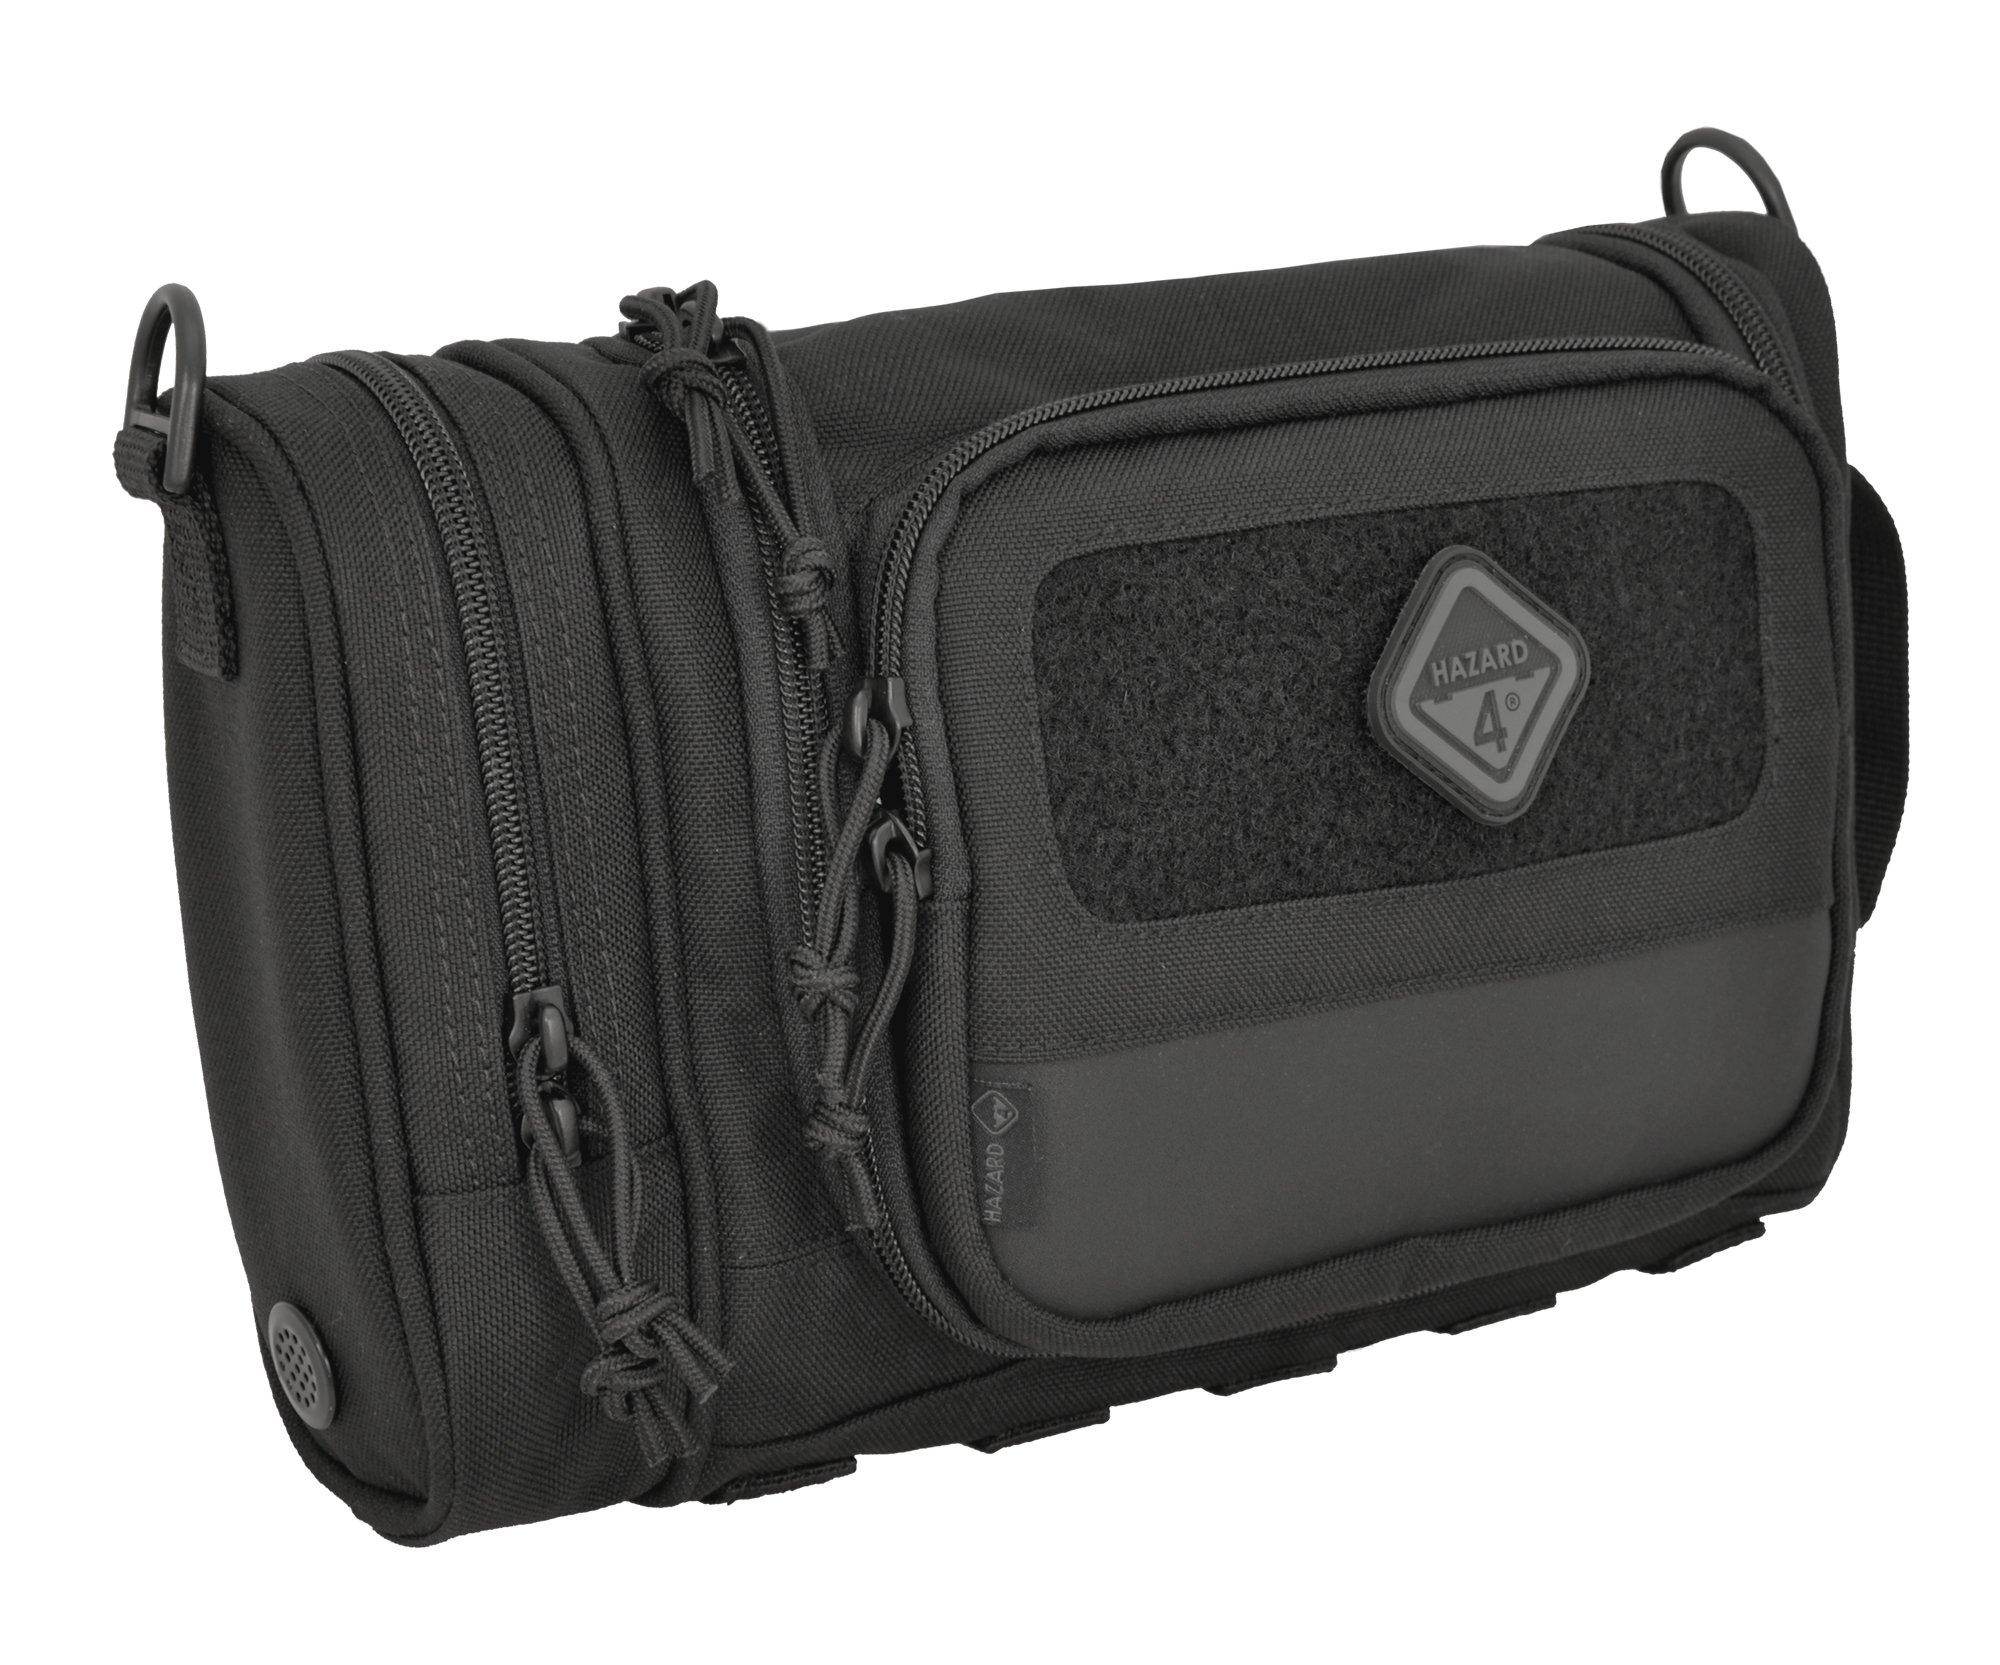 Hazard 4 (RVL-CRD-BLK) Reveille Rugged Grooming Kit/Heavy-Duty Toiletry Bag, Black